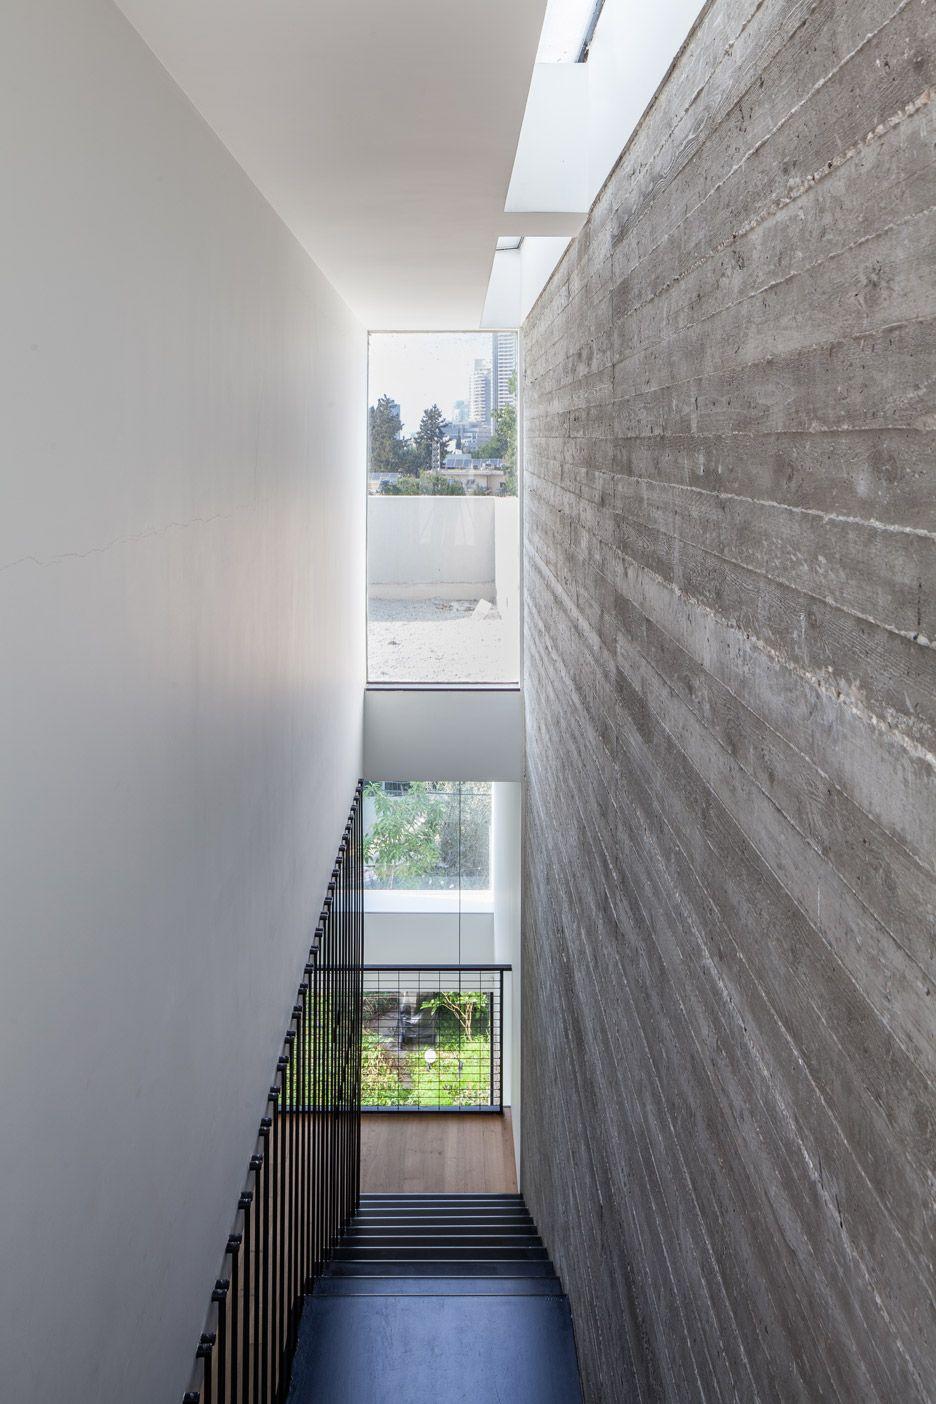 Mendelkern_tel Aviv_david Lebenthal Architects_tal  # Muebles Excell Aguascalientes